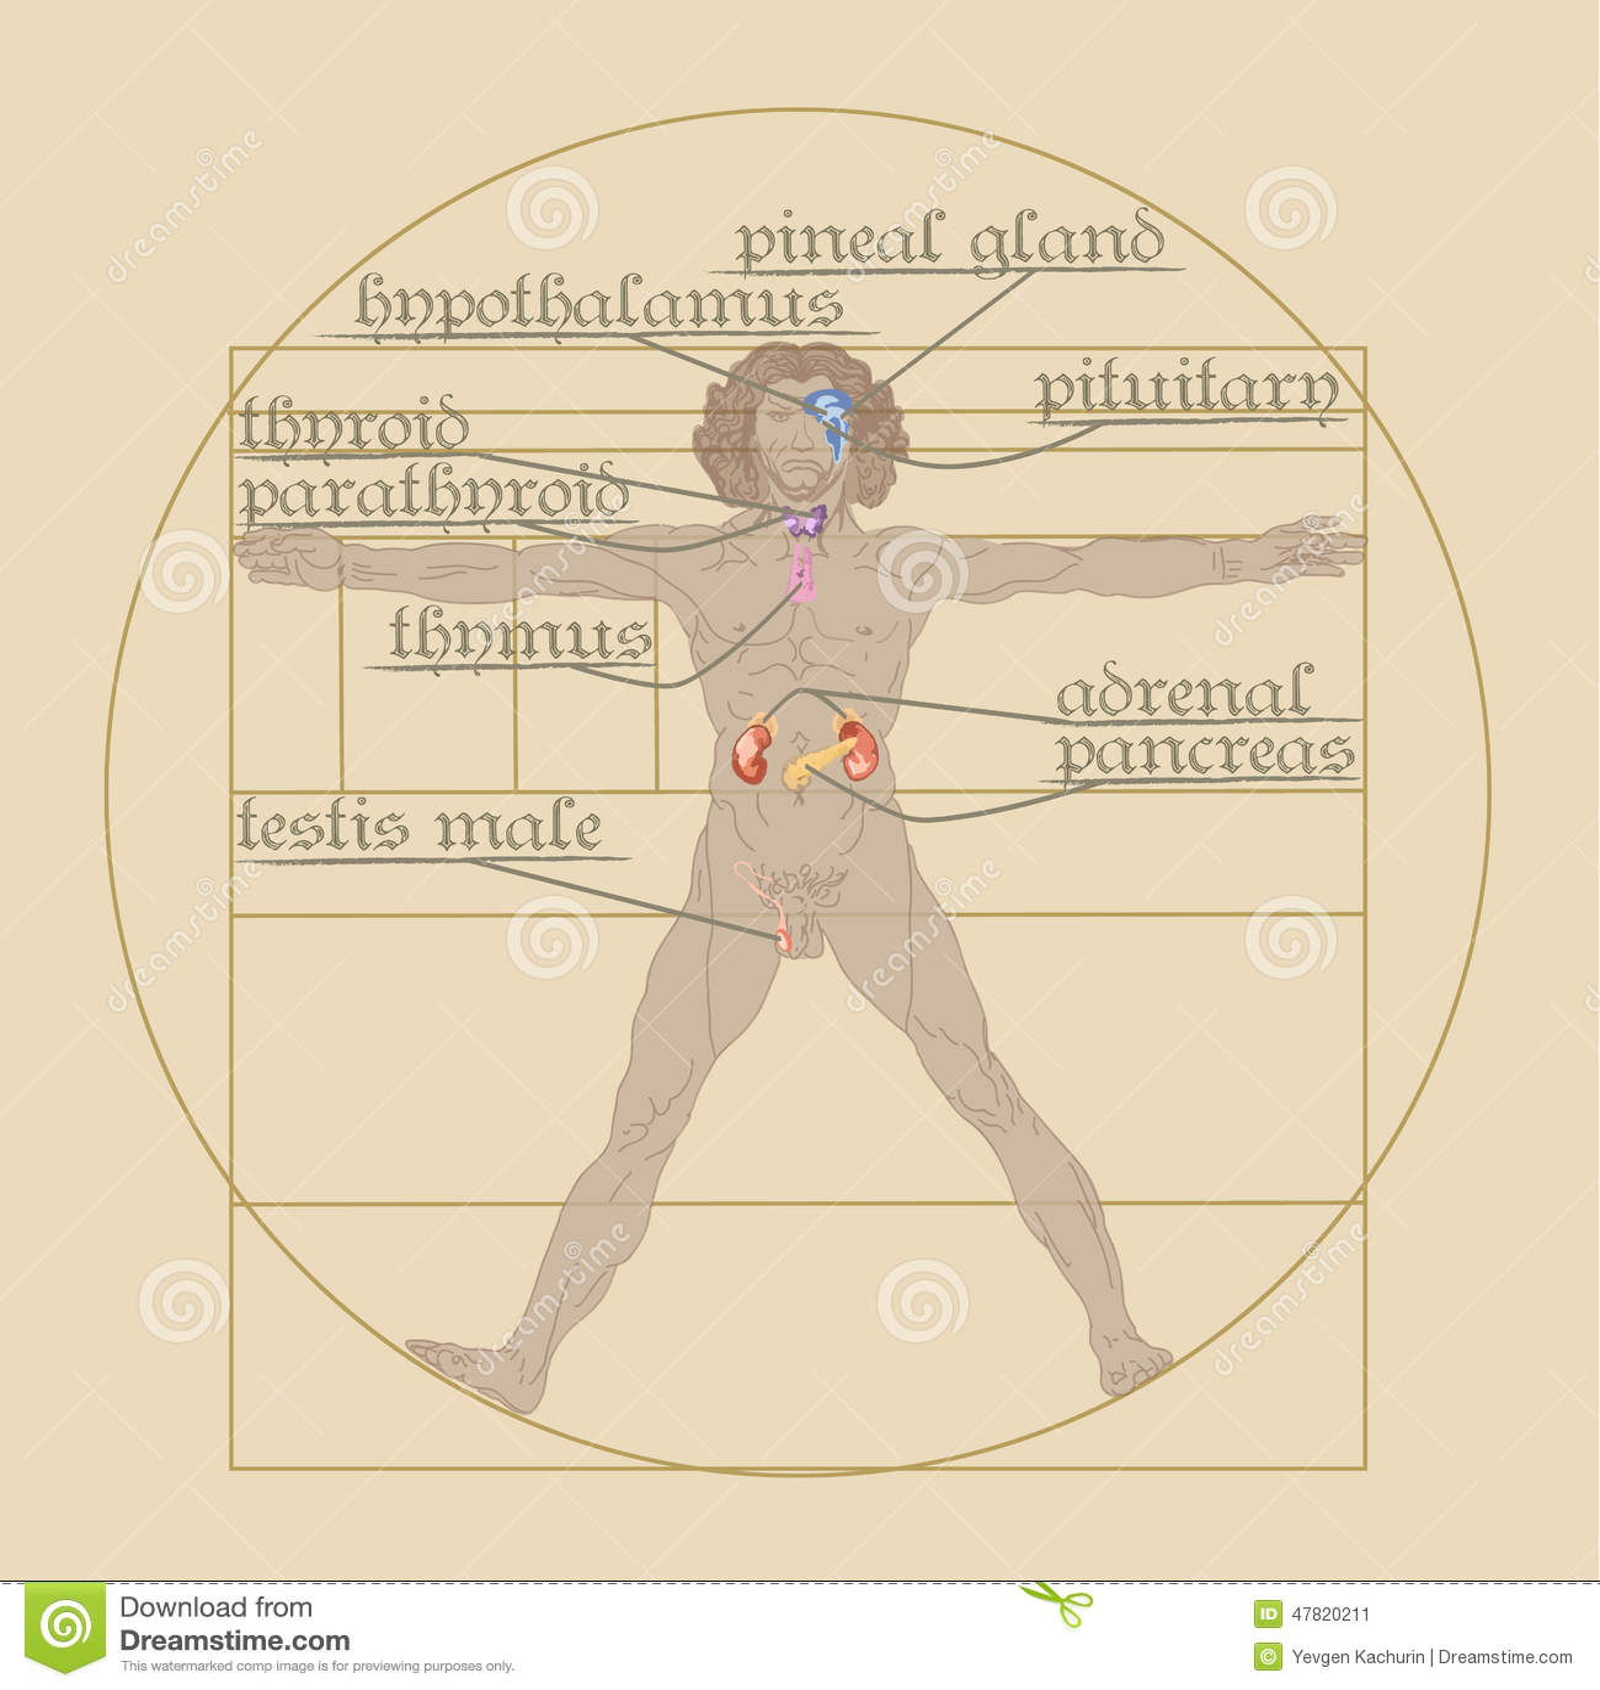 Endocrine System On The Vitruvian Man Editorial Photo Illustration